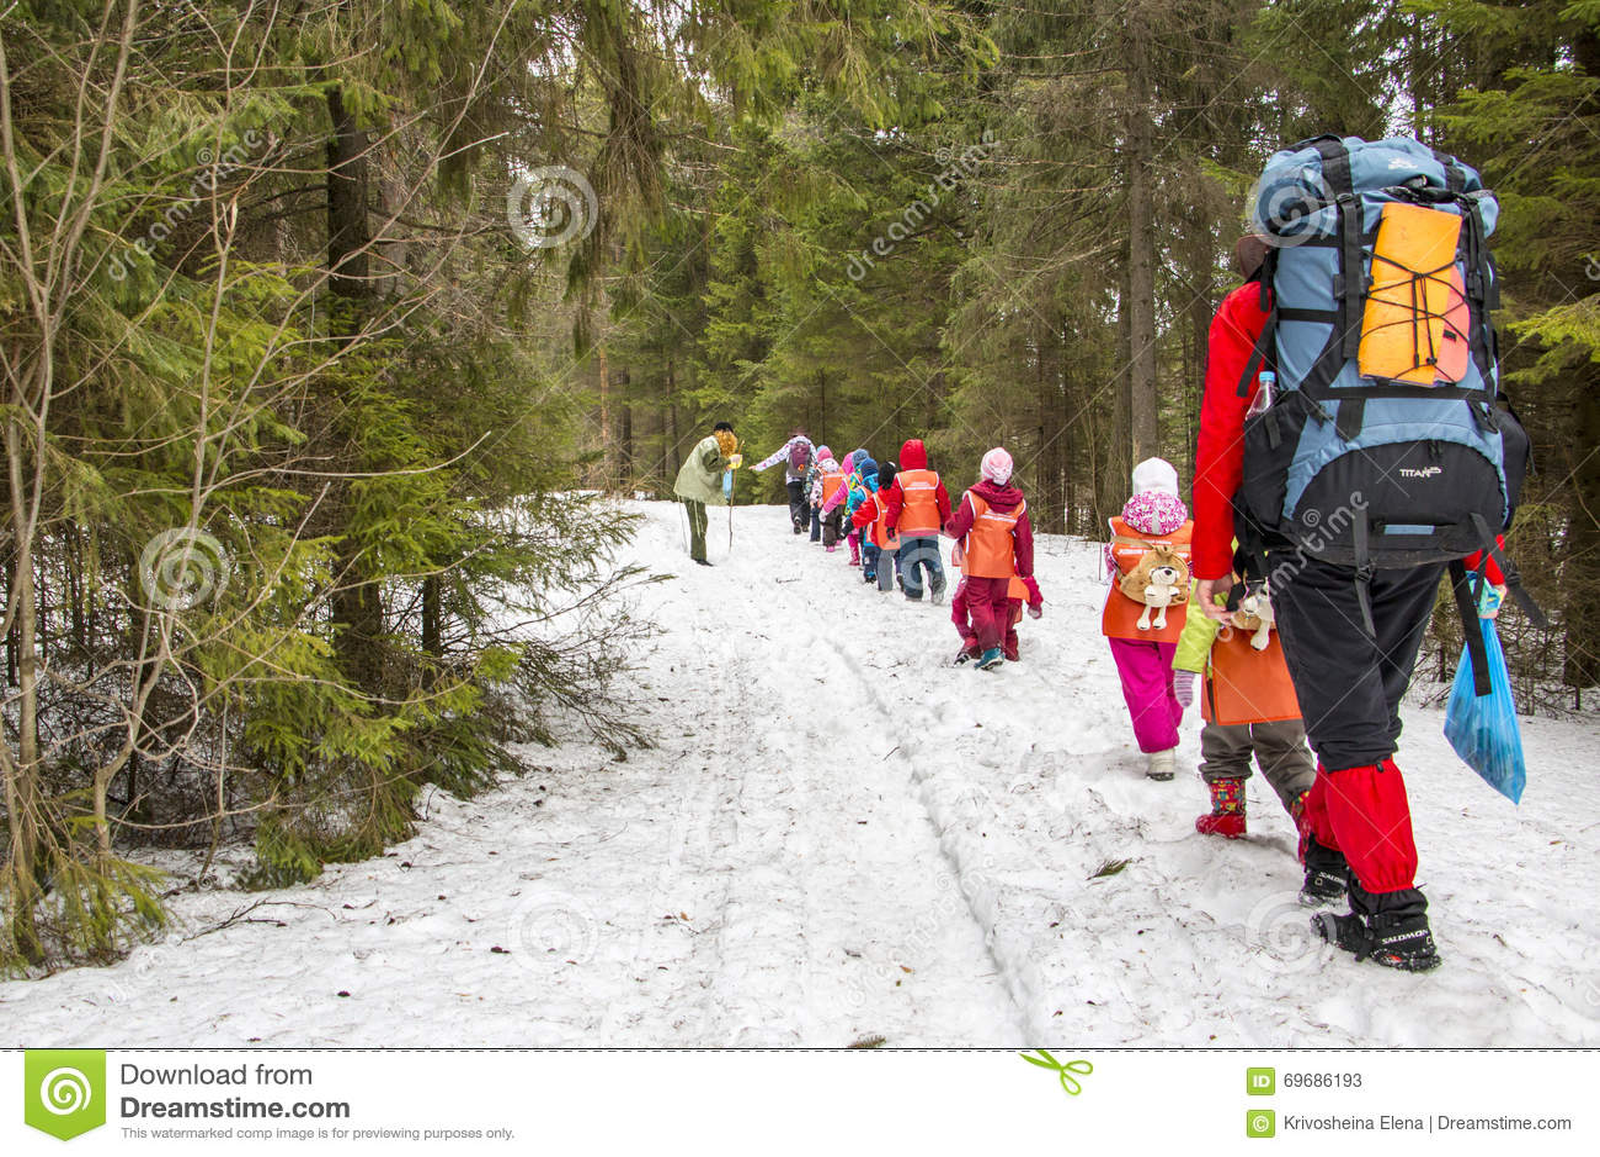 Travel to the forest of schoolchildren